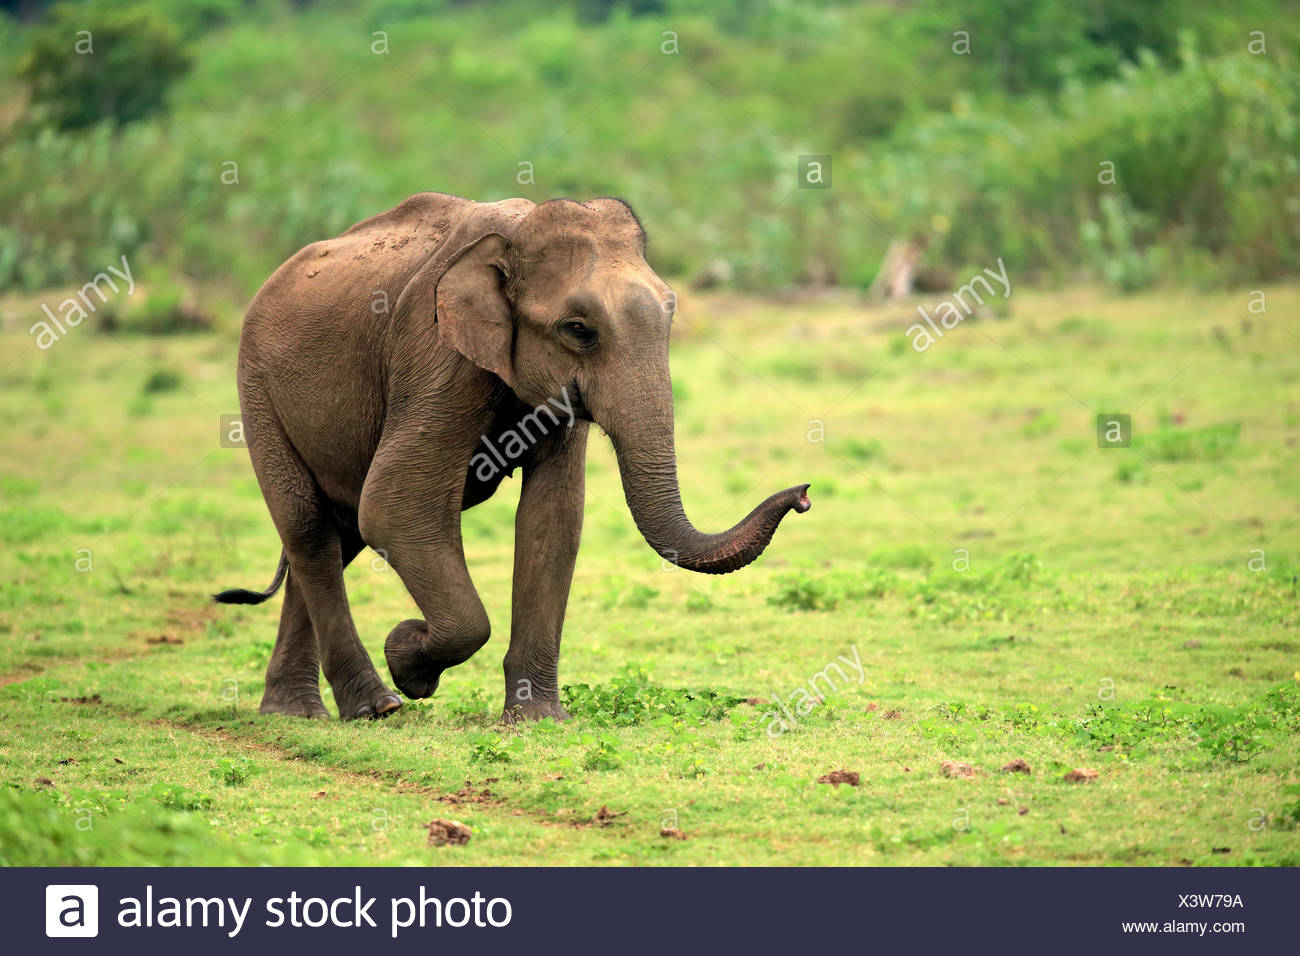 L'éléphant d'Asie, Sri Lanka, l'éléphant mâle adulte, parc national Udawalawe, Sri Lanka, Asie / (Elephas maximus maximus) Photo Stock